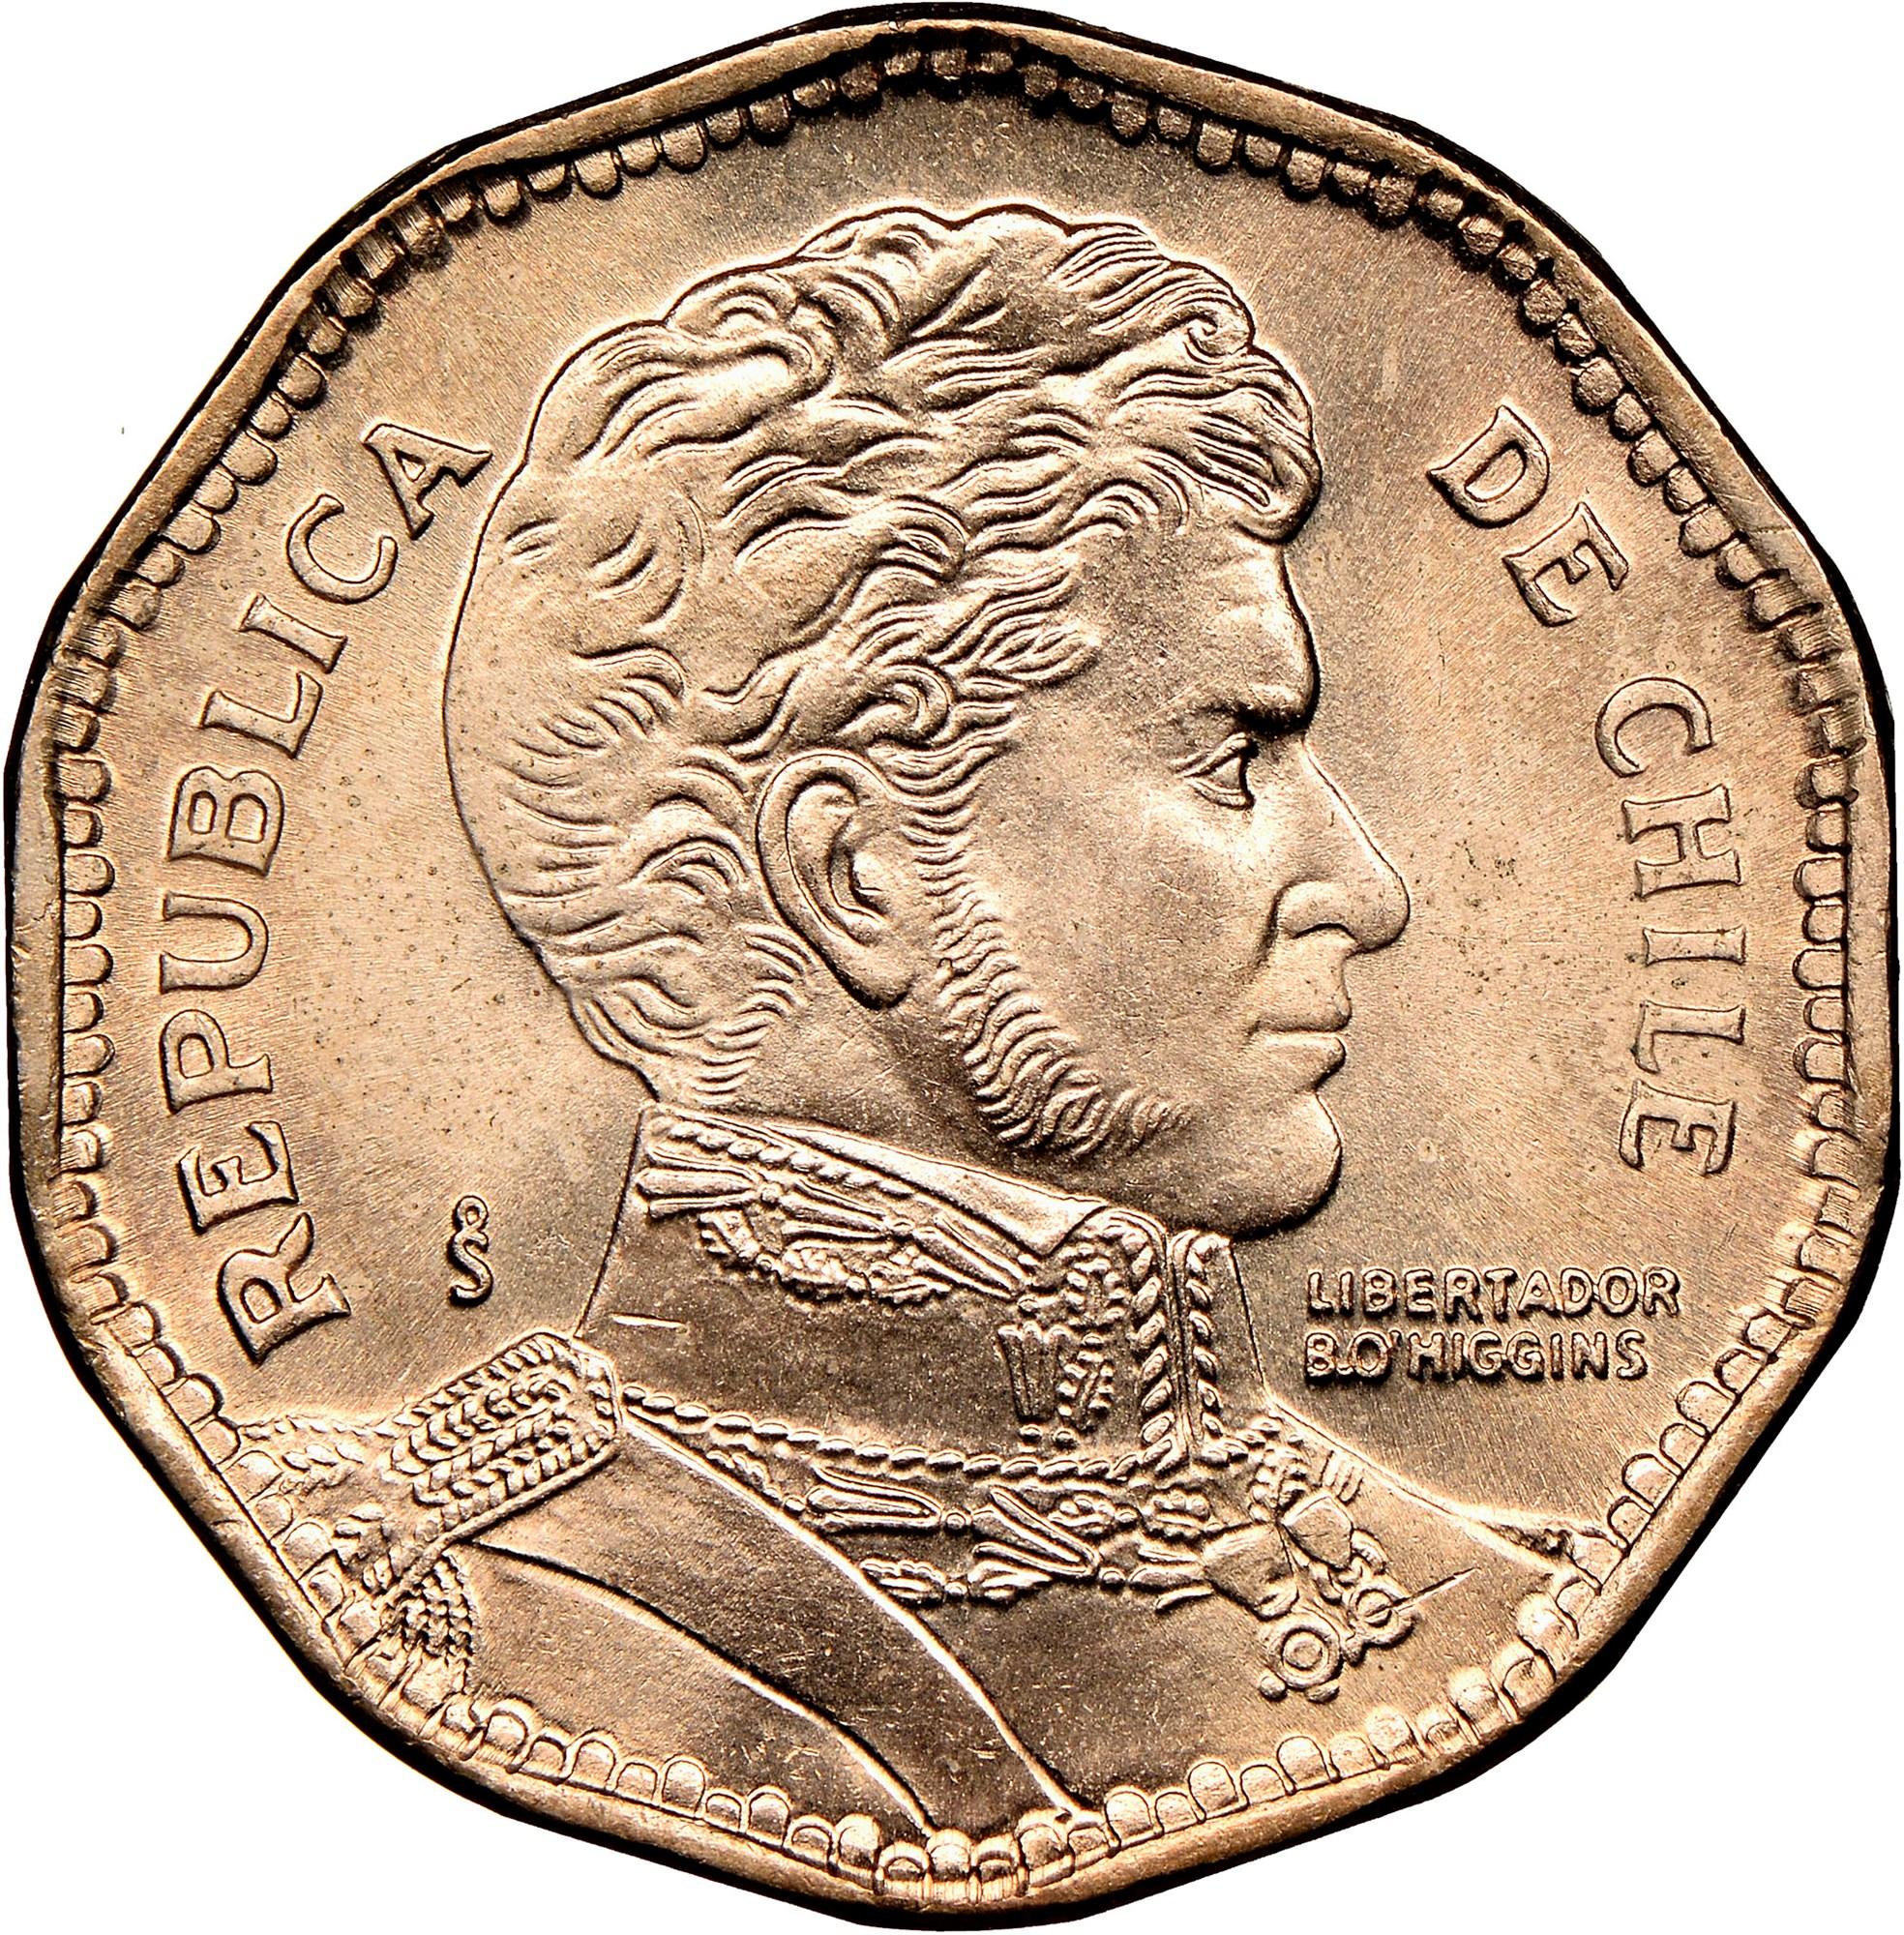 Chile 50 Pesos obverse